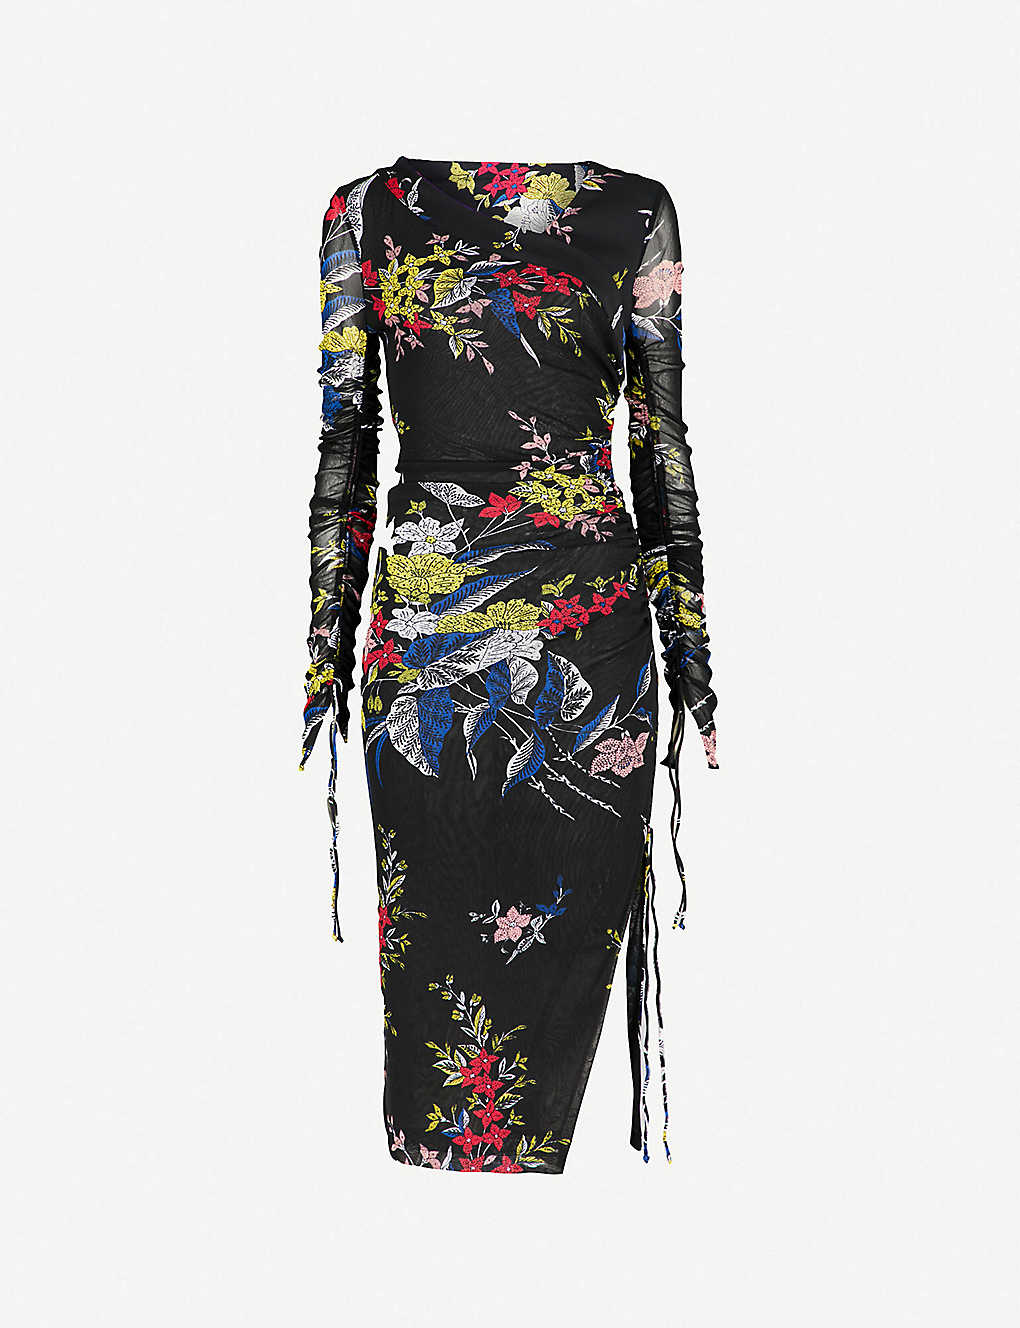 97ffb2a7a0f59d DIANE VON FURSTENBERG - Floral-print stretch-silk mesh dress ...